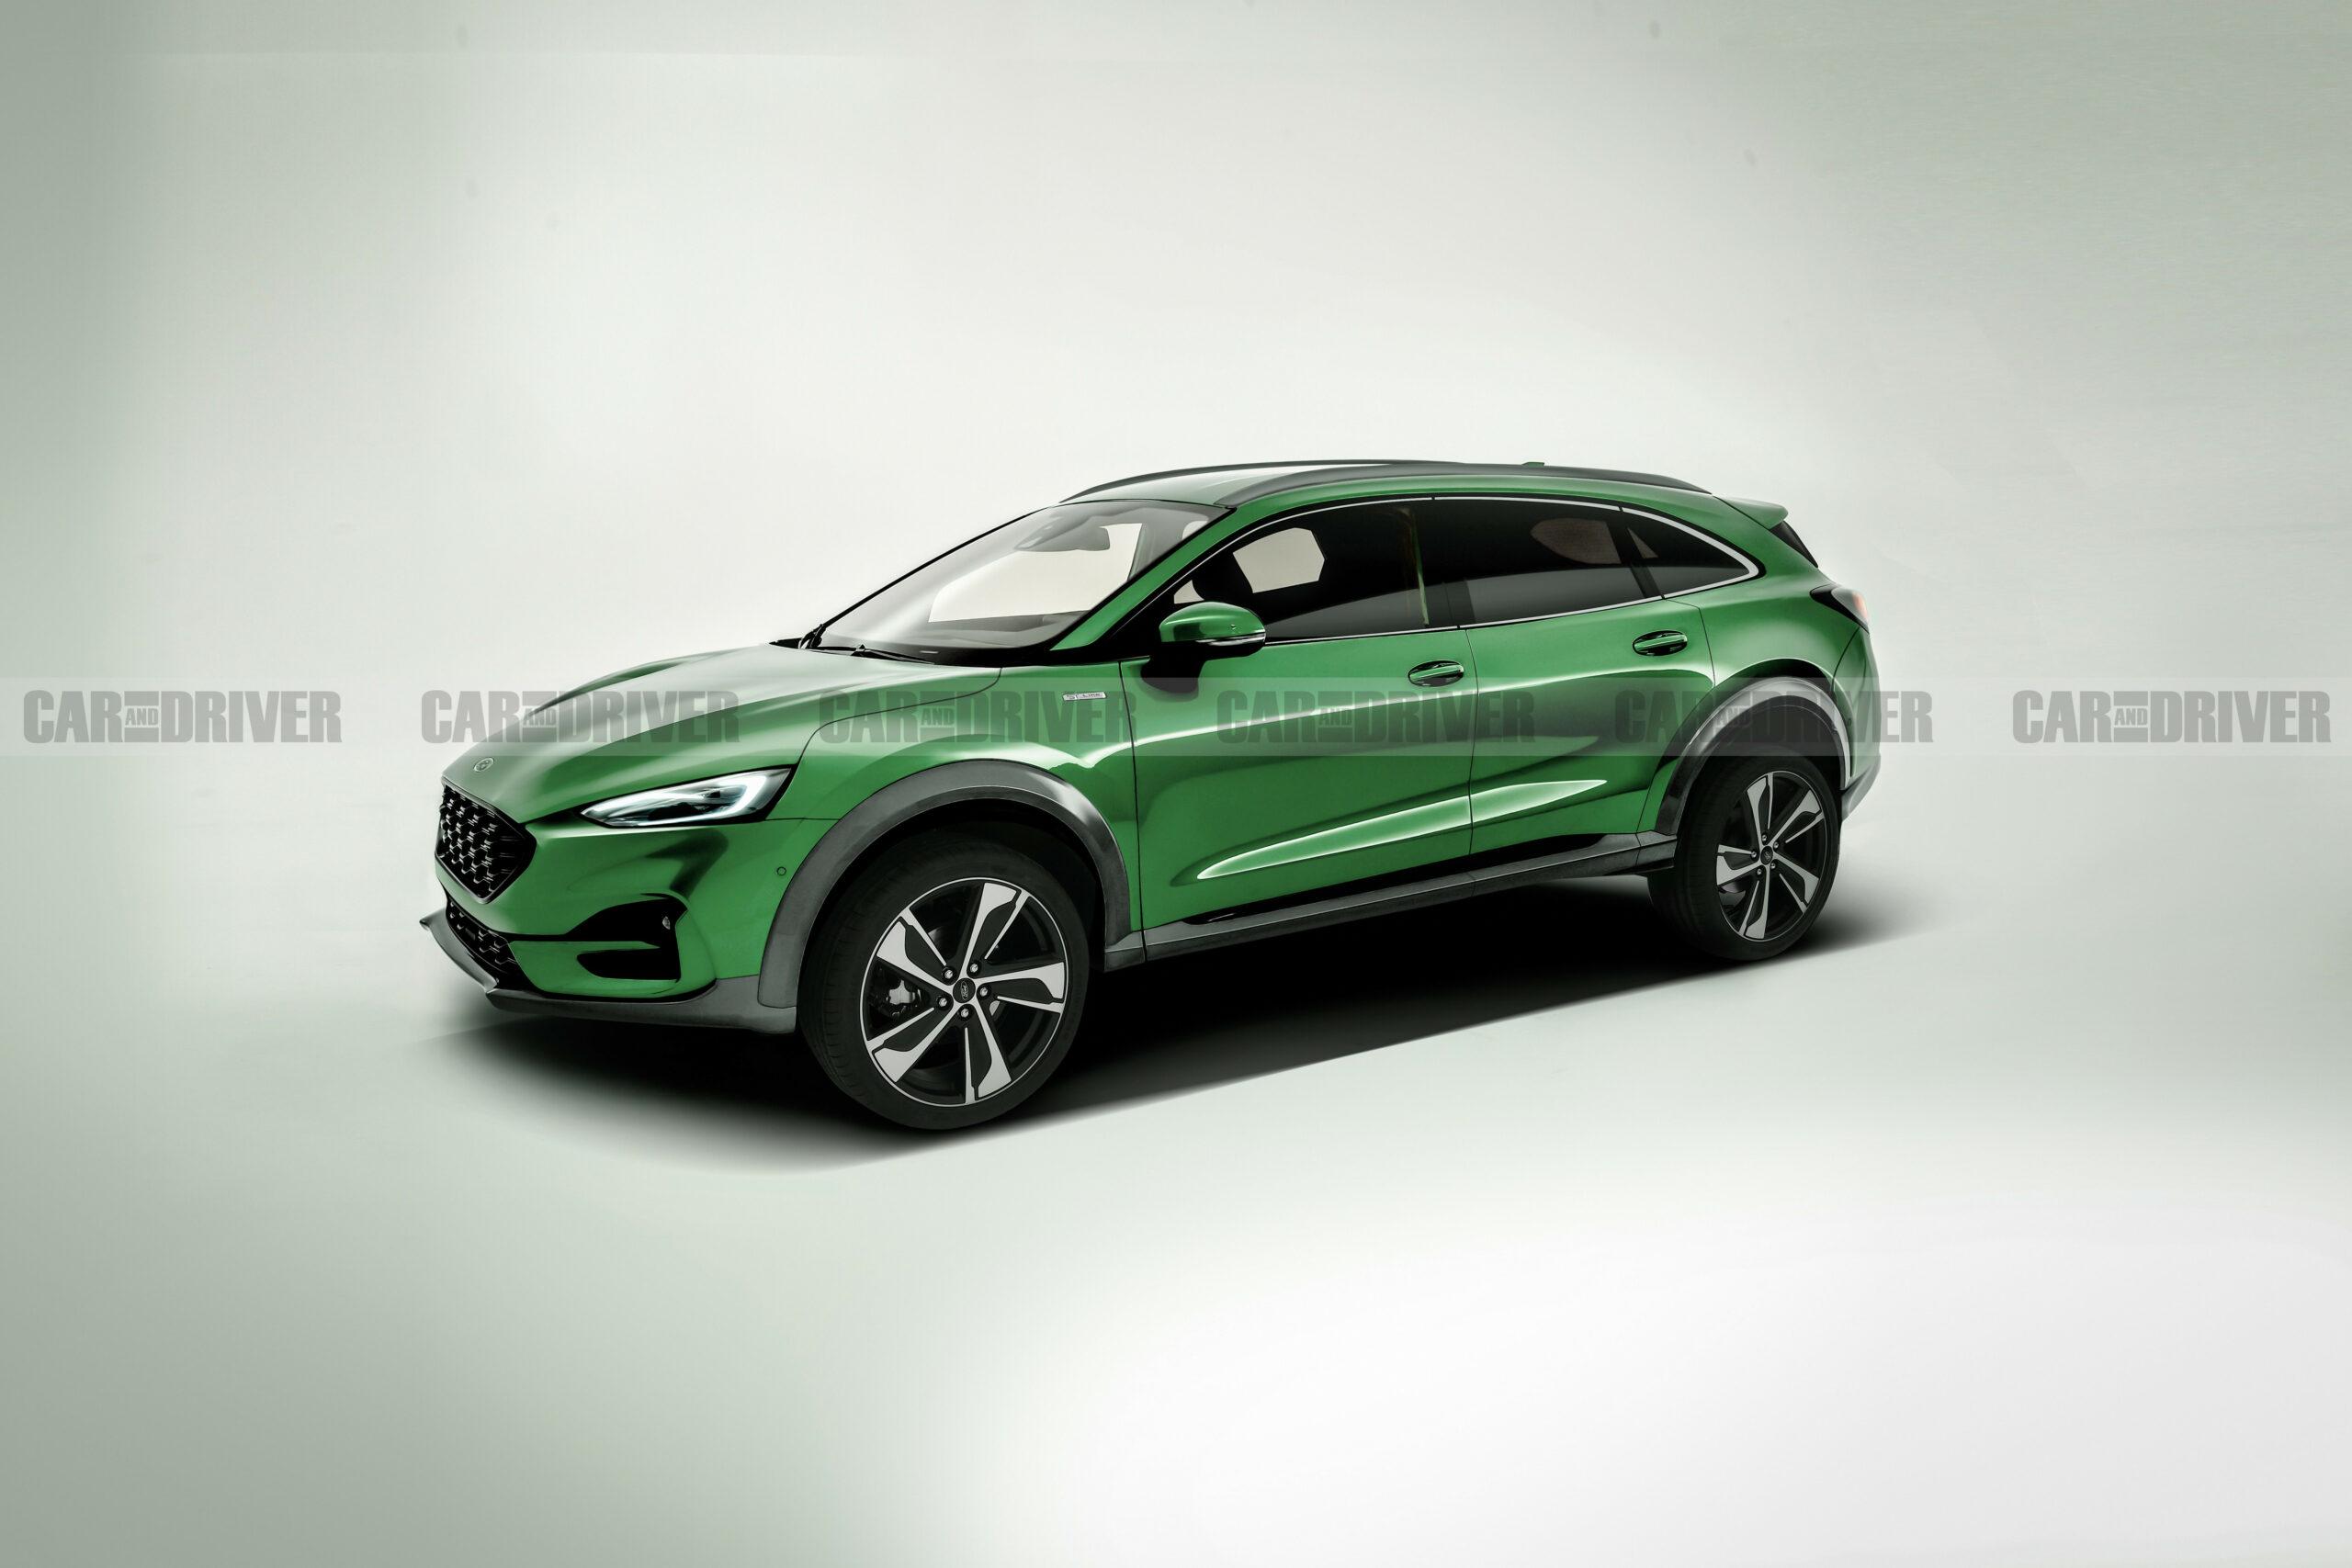 Model 2022 Ford Fusion Energi